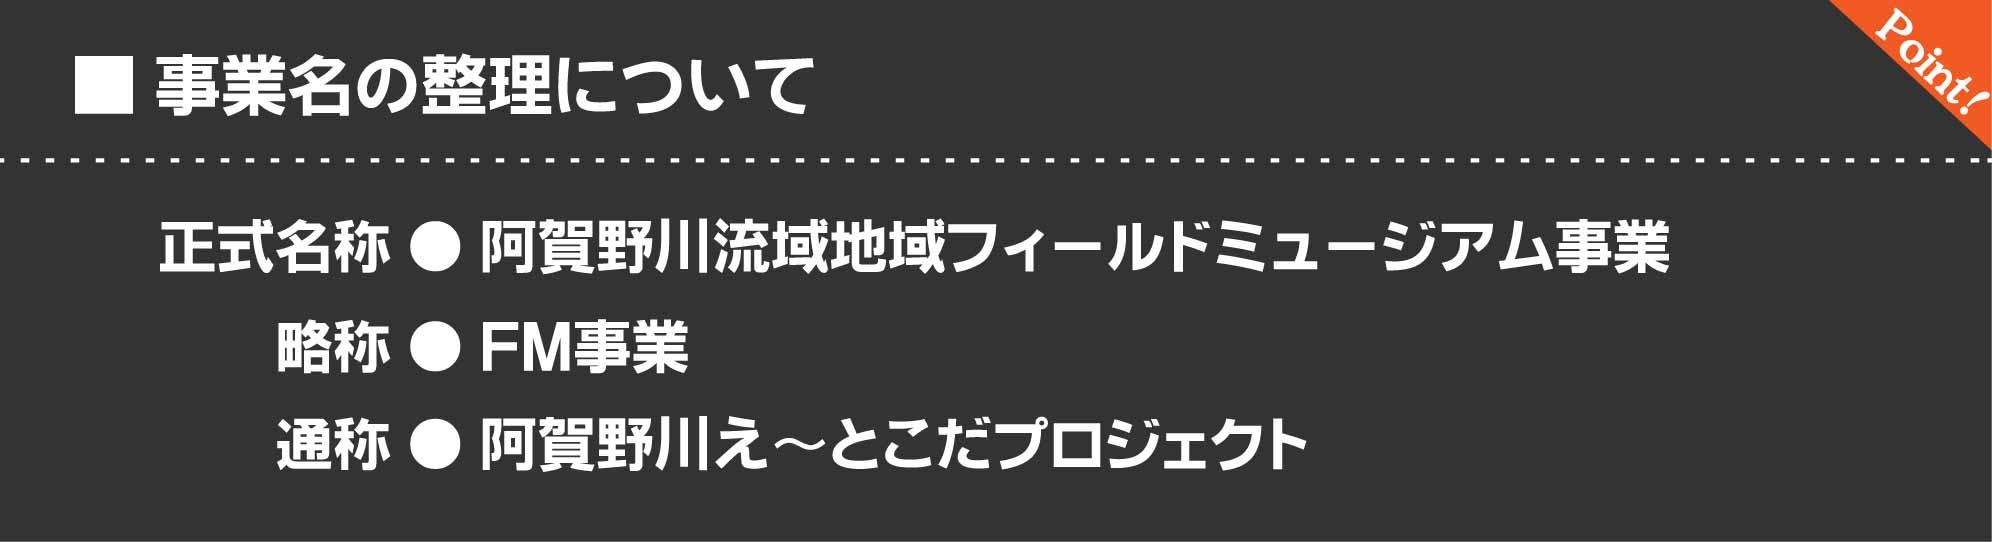 fm1-box